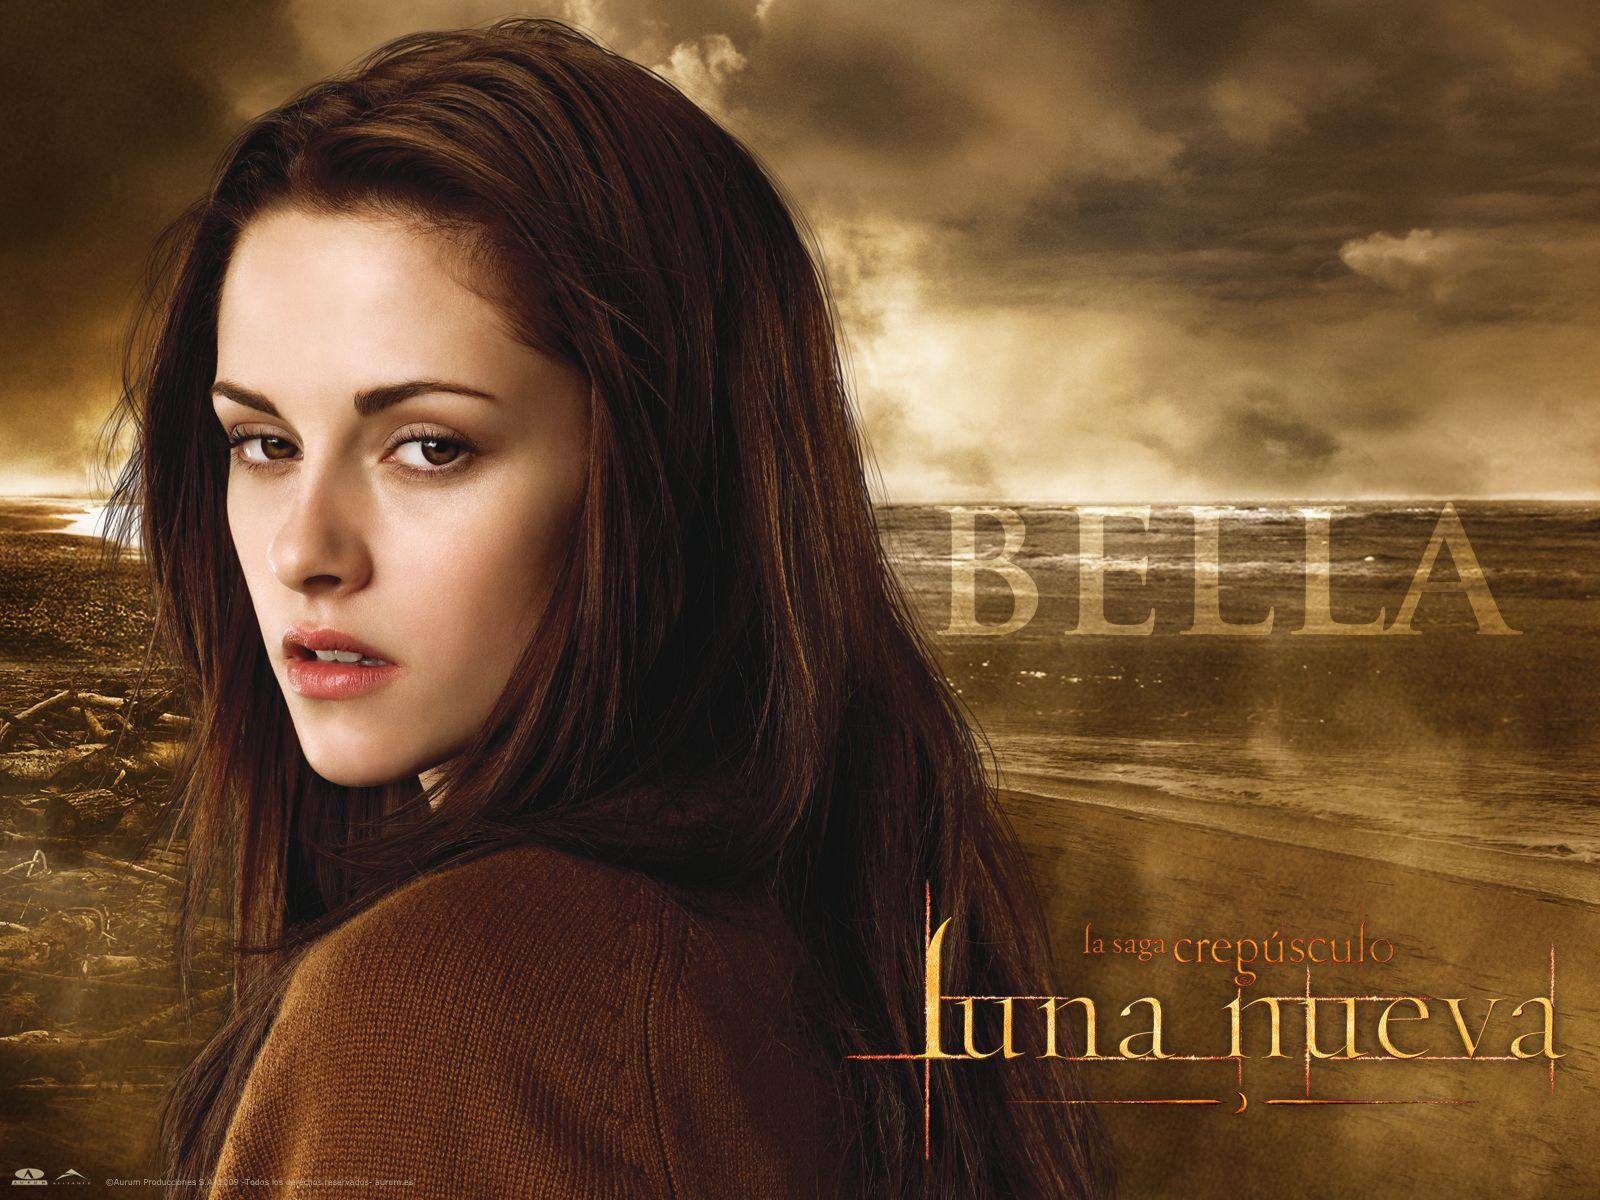 Pin By Lara Reyanne On Twilight Bella Swan Twilight Saga New Moon